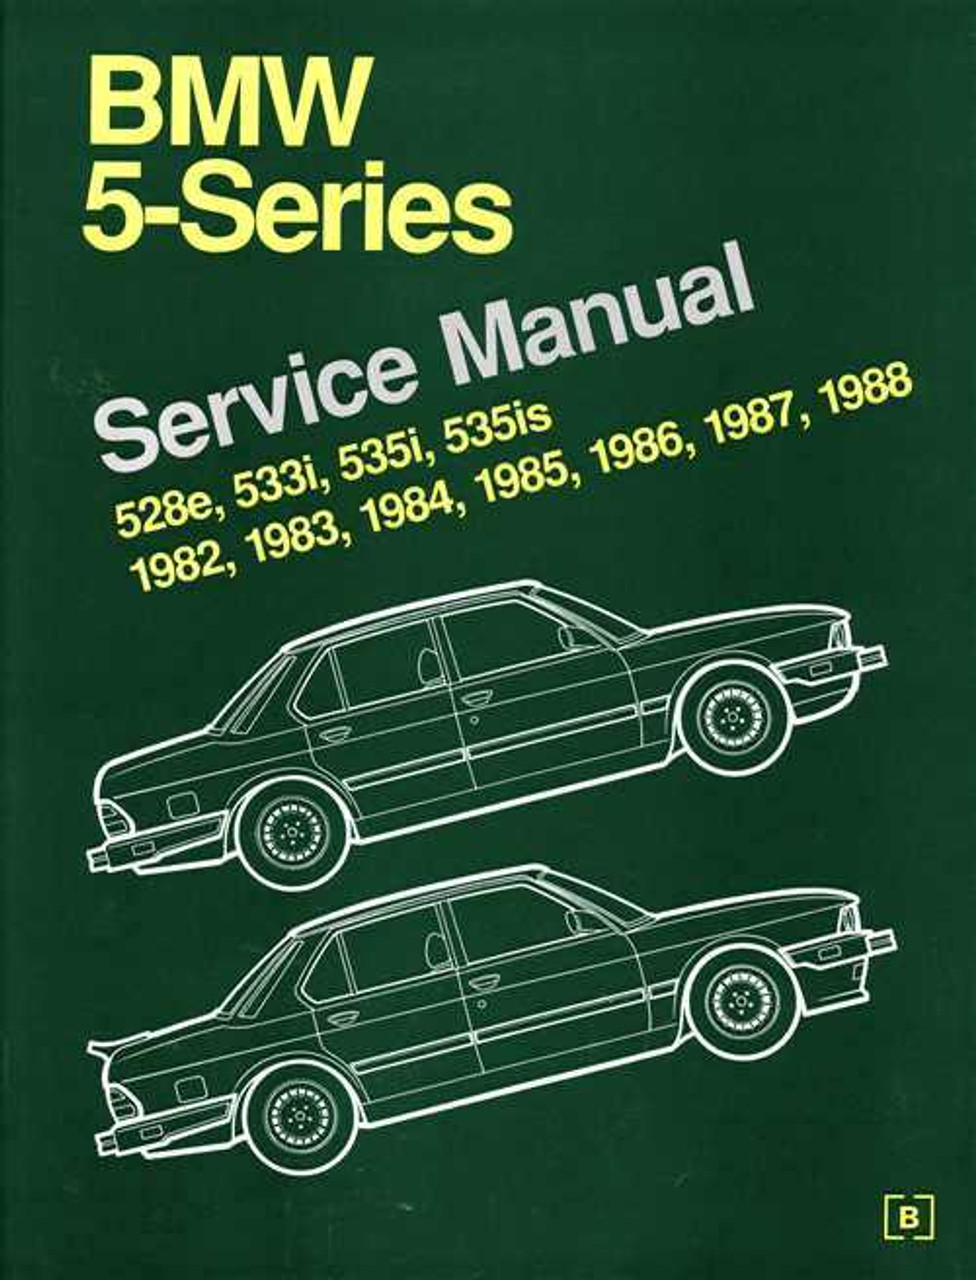 Bmw 5 Series E28 1982 1988 Workshop Manual